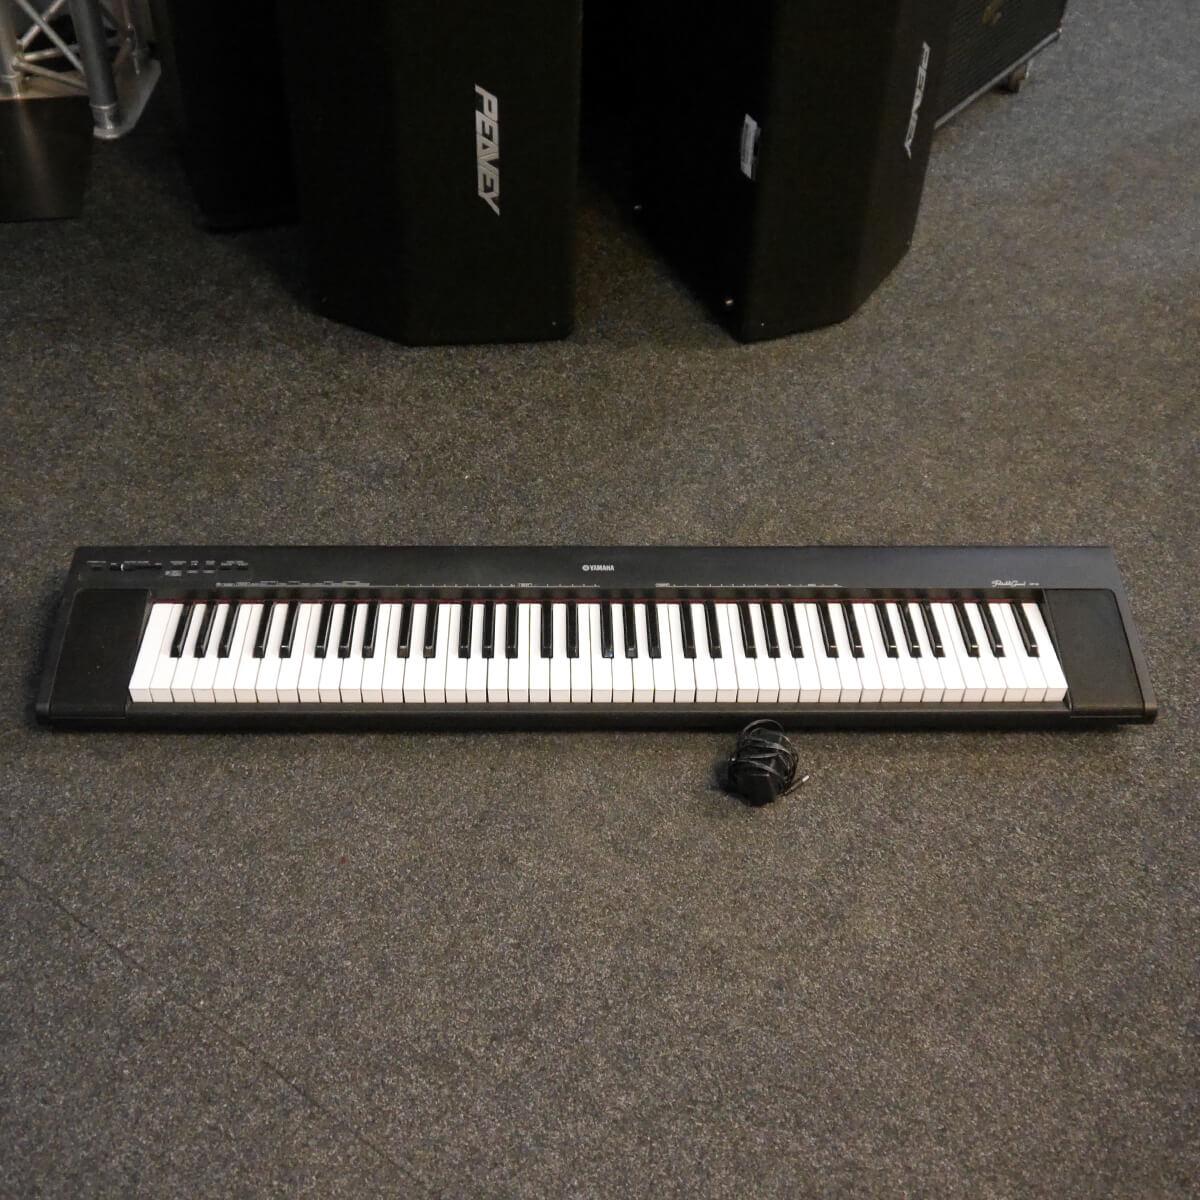 Yamaha NP-30 Portable Piano w/Power Supply - 2nd Hand